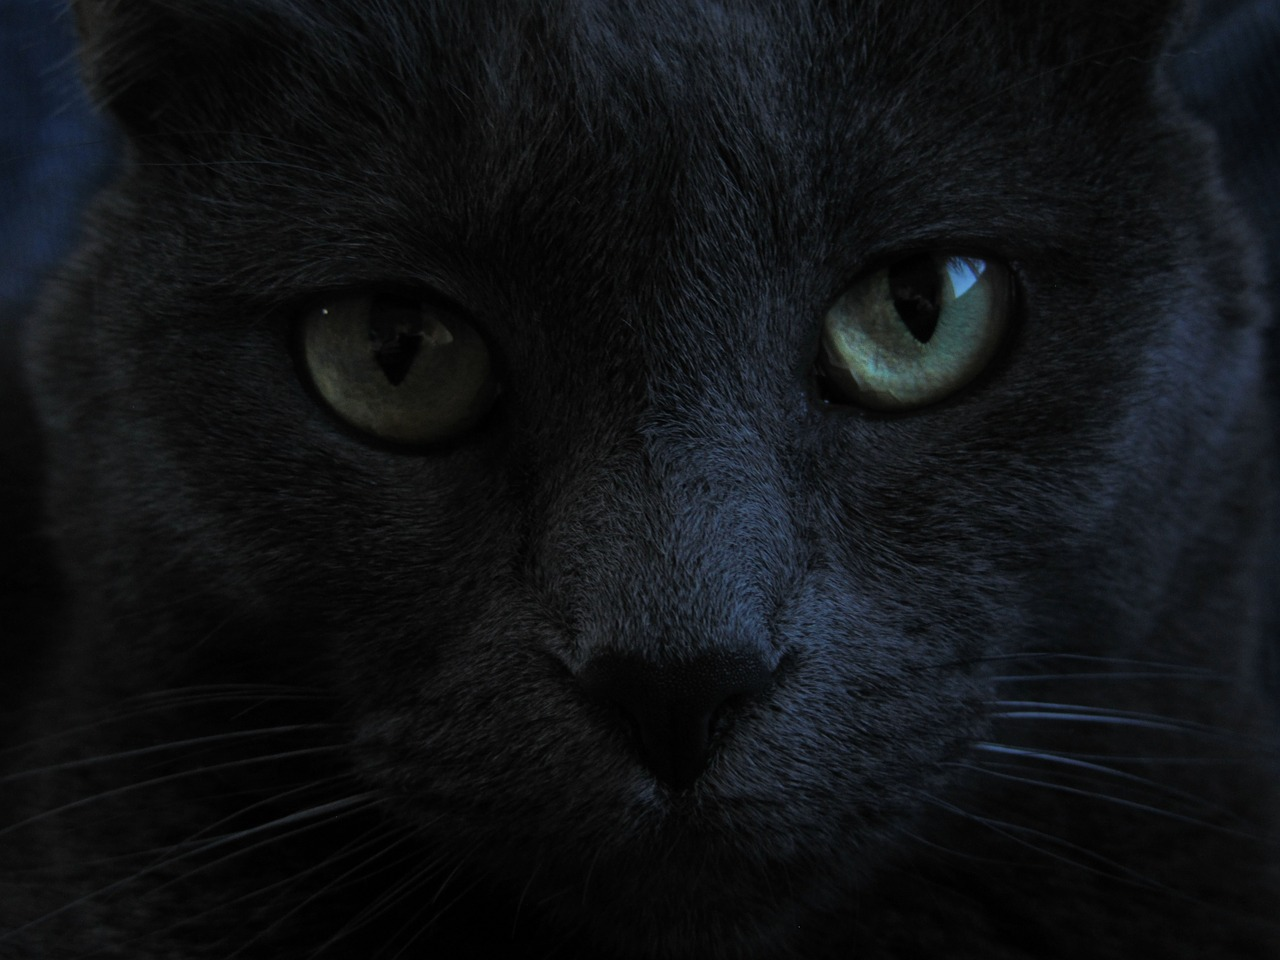 Close up of a black cat face